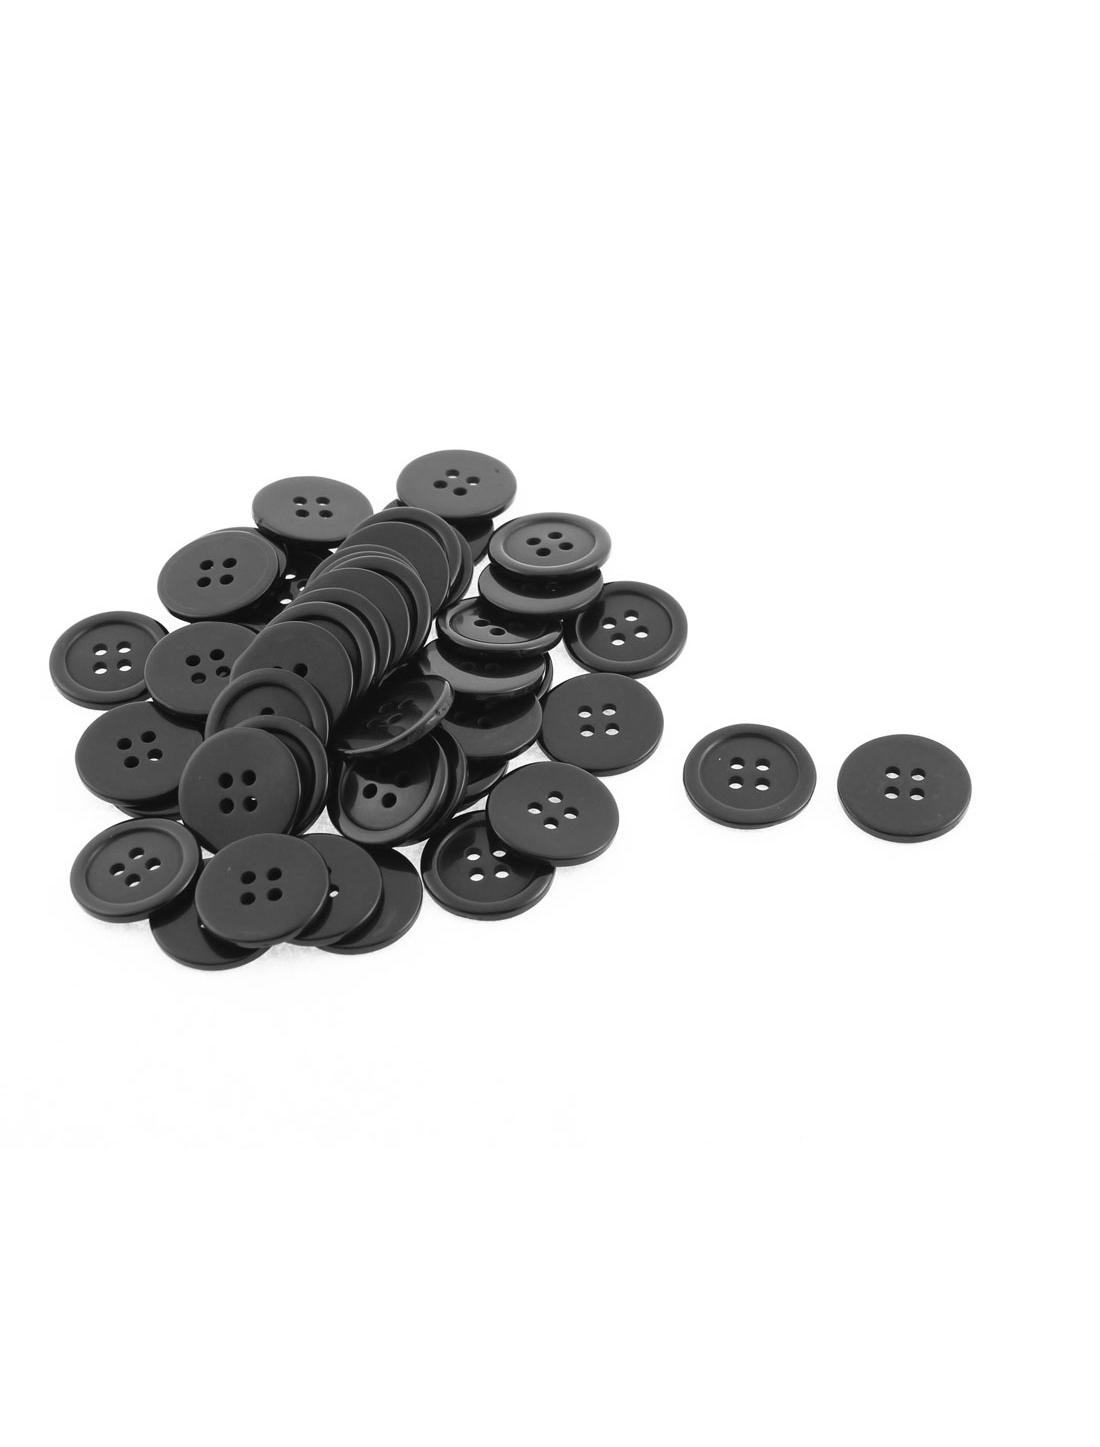 50Pcs 4 Holes Round Design Sewing Buttons Scrapbook Black